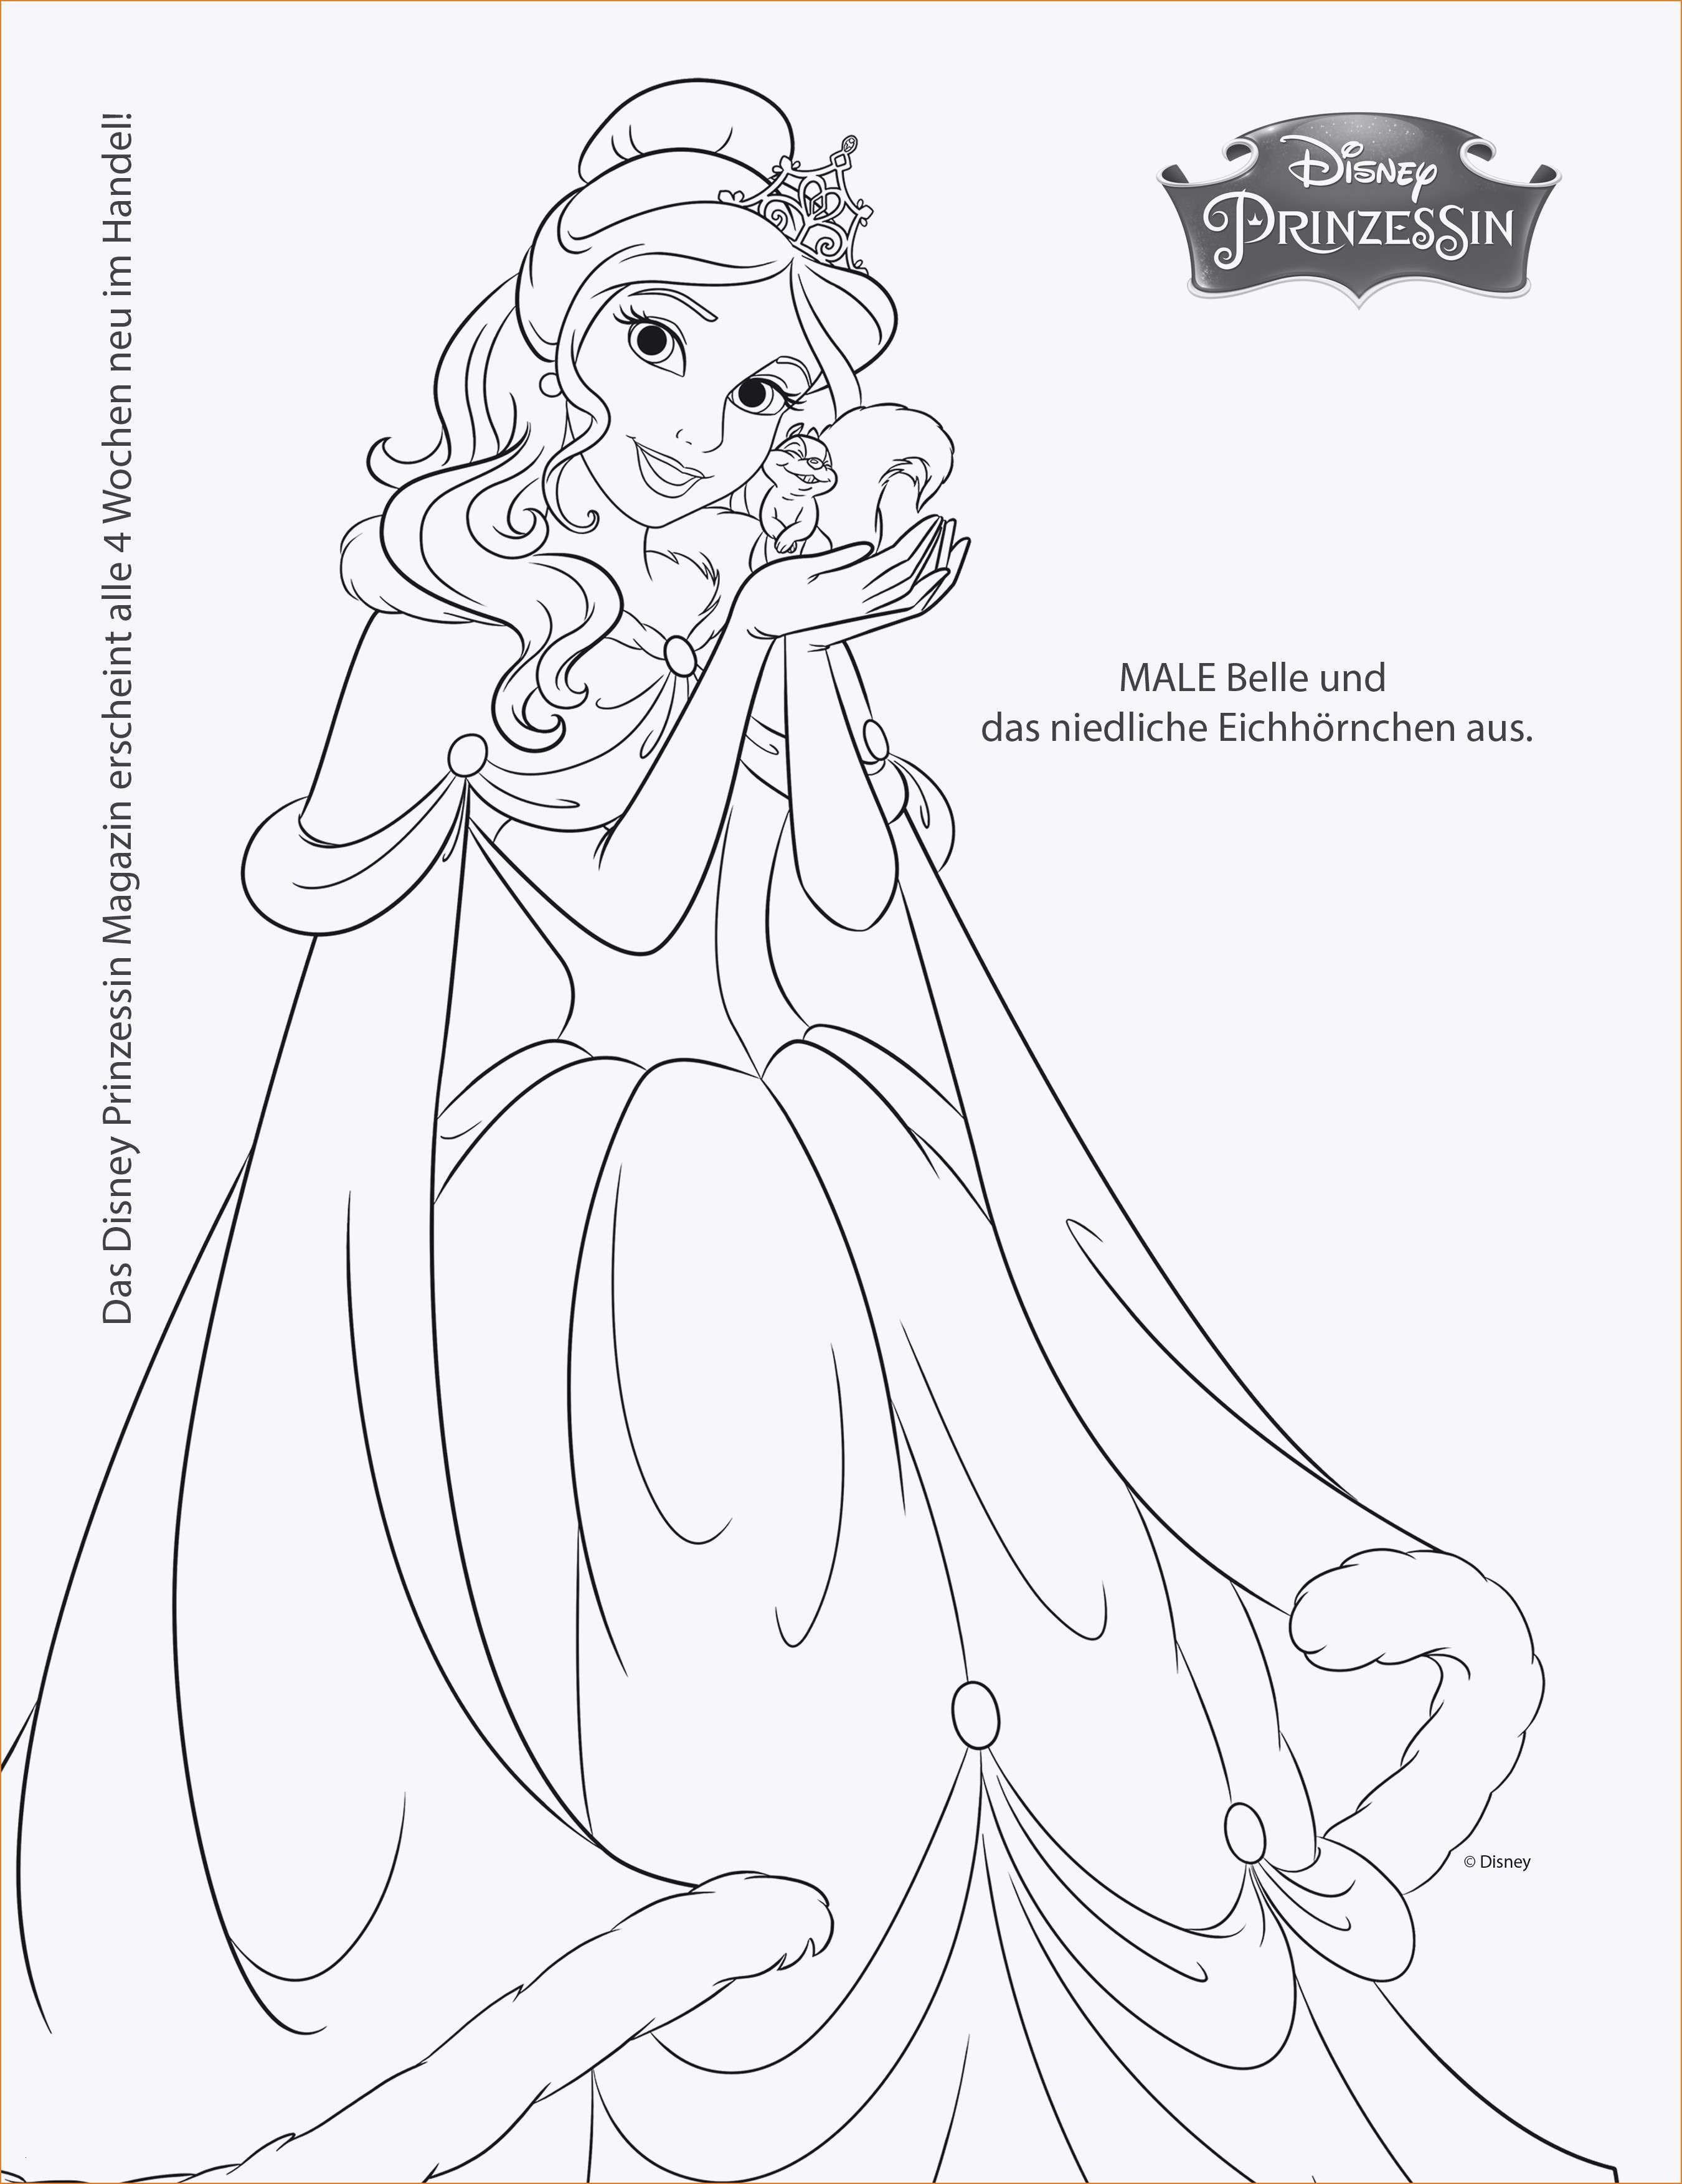 Pj Masks Ausmalbilder Inspirierend Ausmalbilder Pj Masks Inspirierend 12 Owlette Coloring Page Schön Pj Sammlung